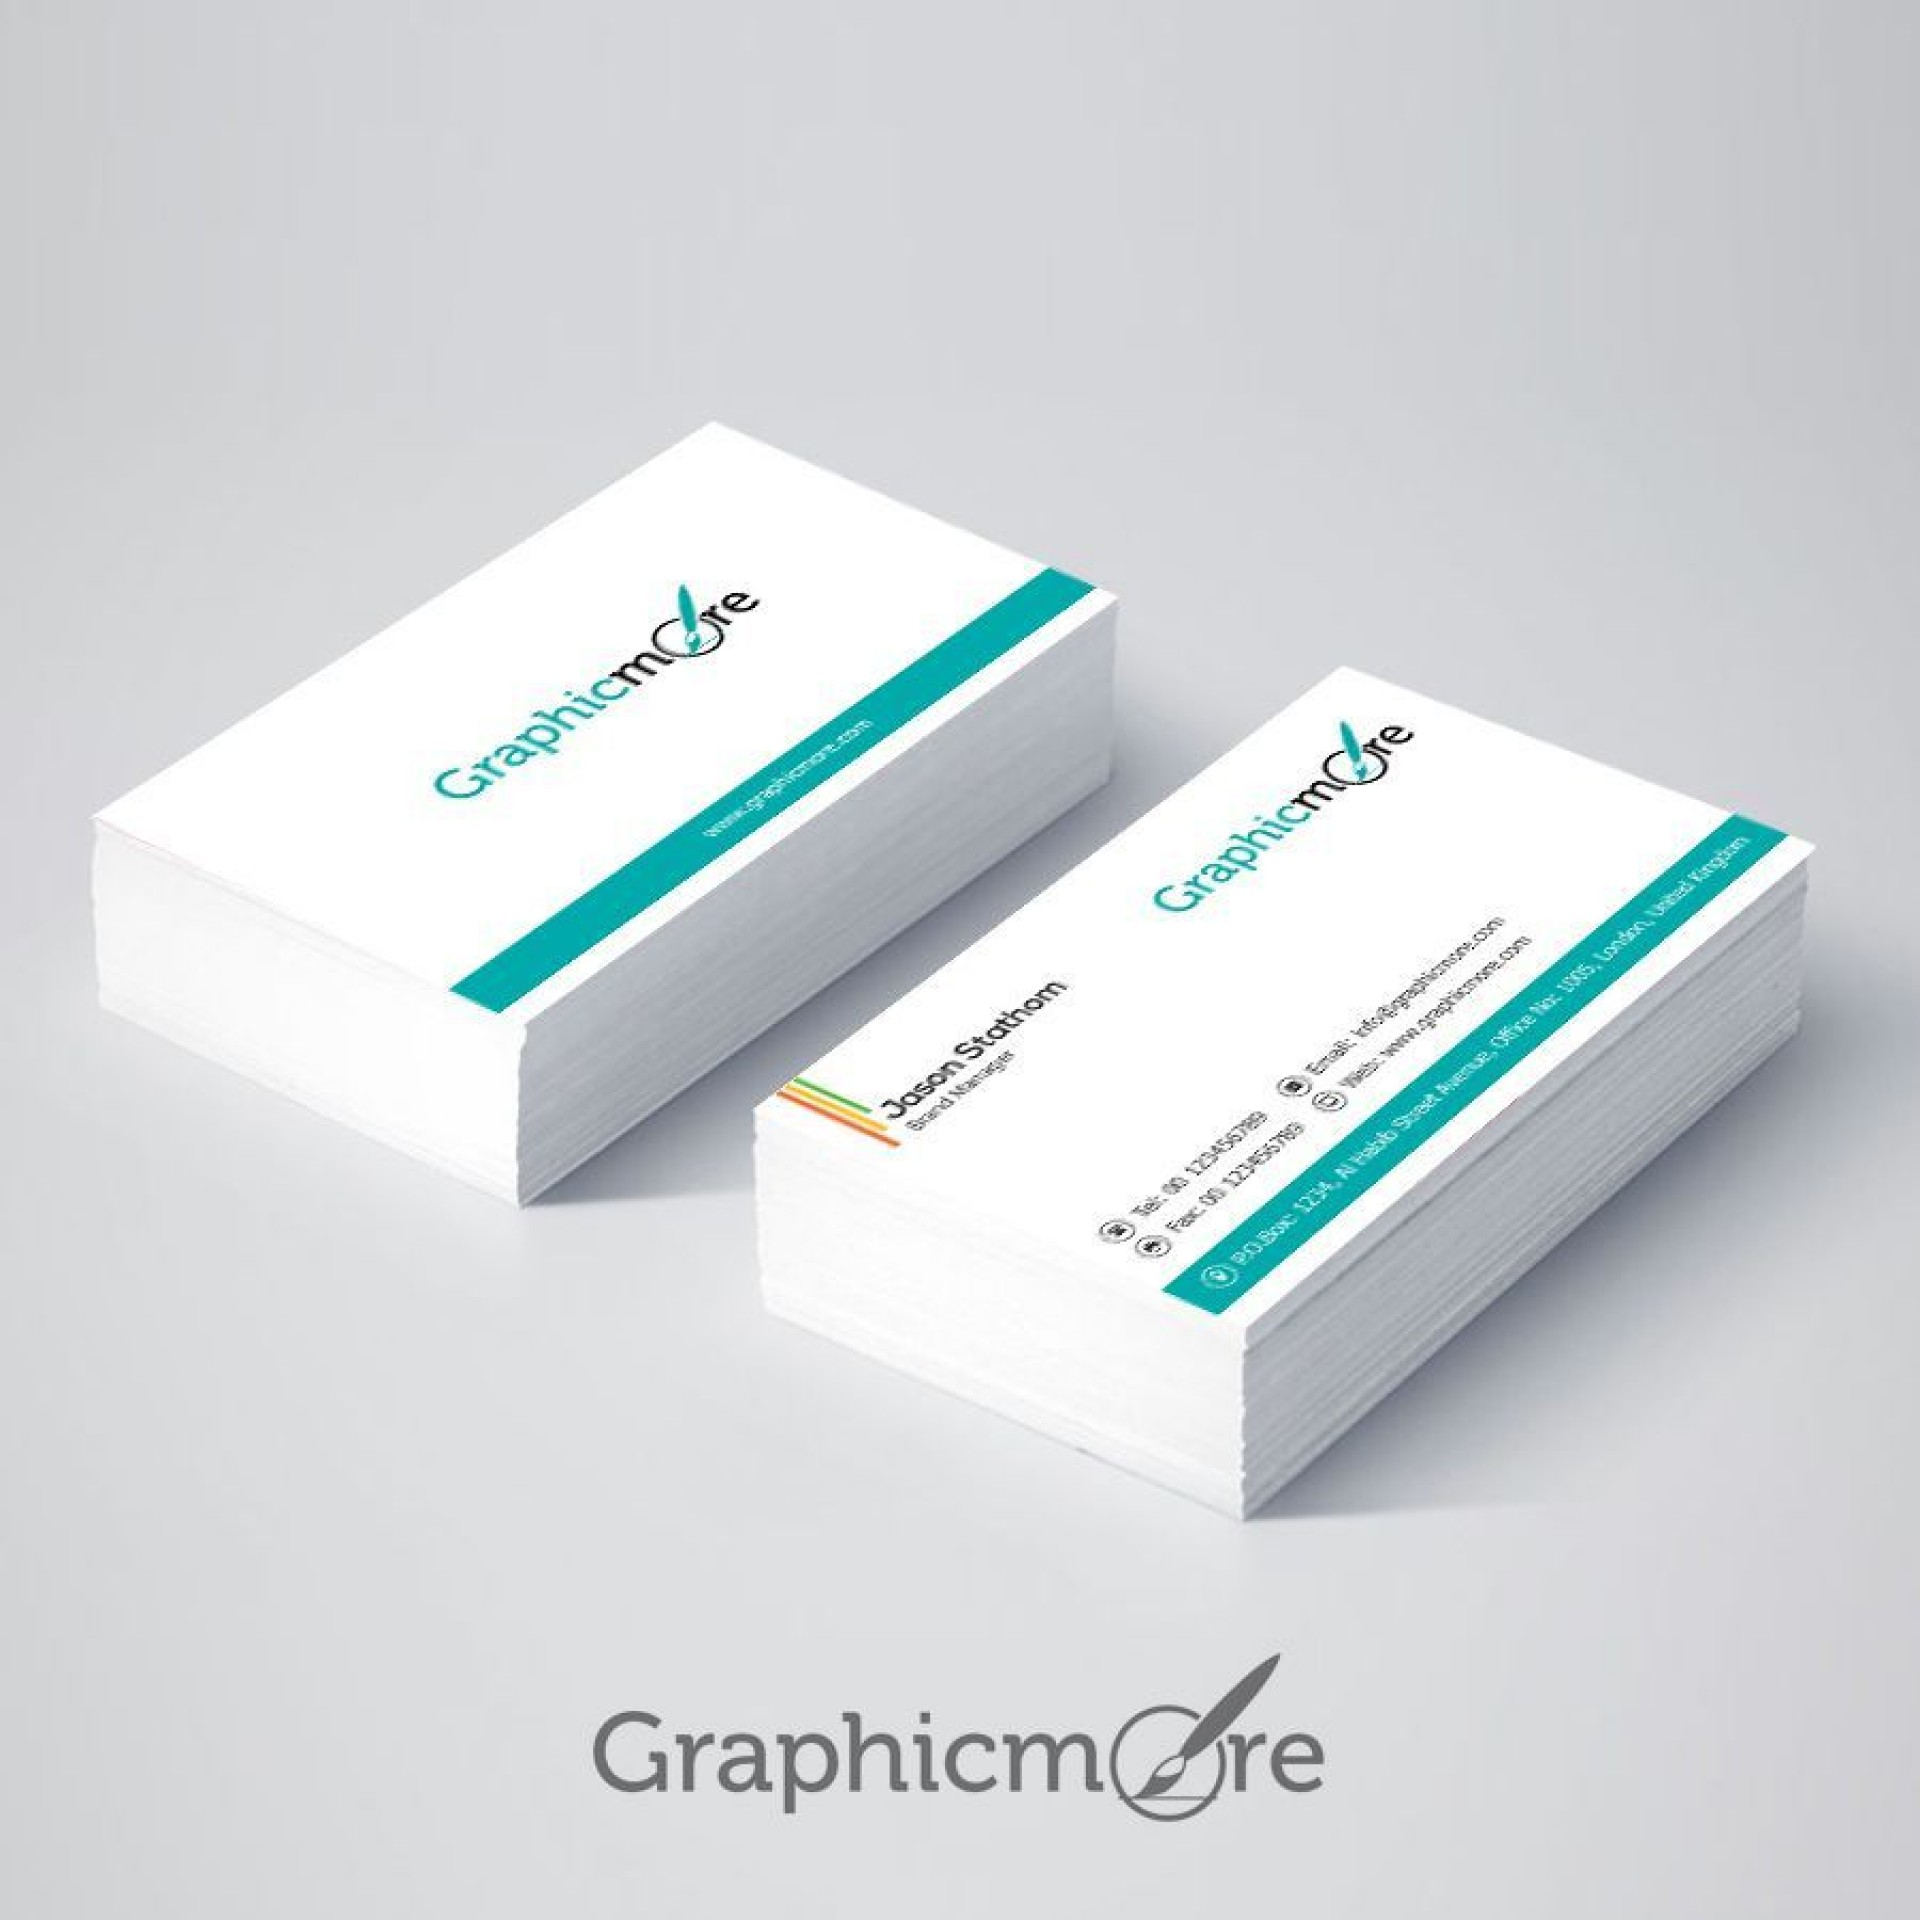 000 Astounding Minimal Busines Card Template Free Download Photo  Simple Design Coreldraw1920